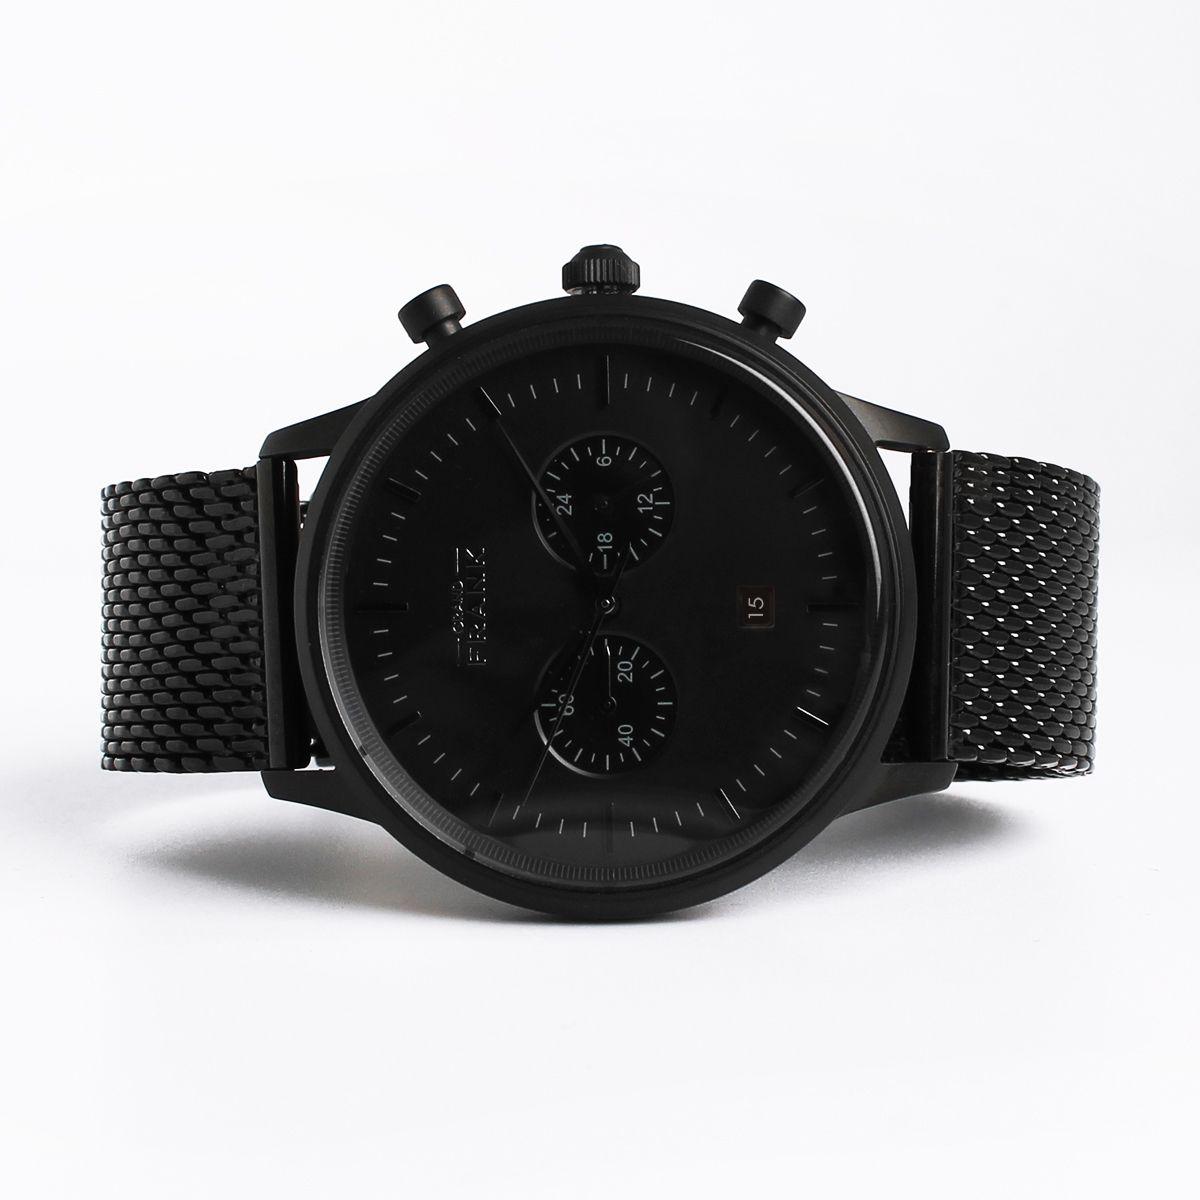 the grand frank kingston matte black mesh watch get it at the grand frank kingston matte black mesh watch get it at grandfrank